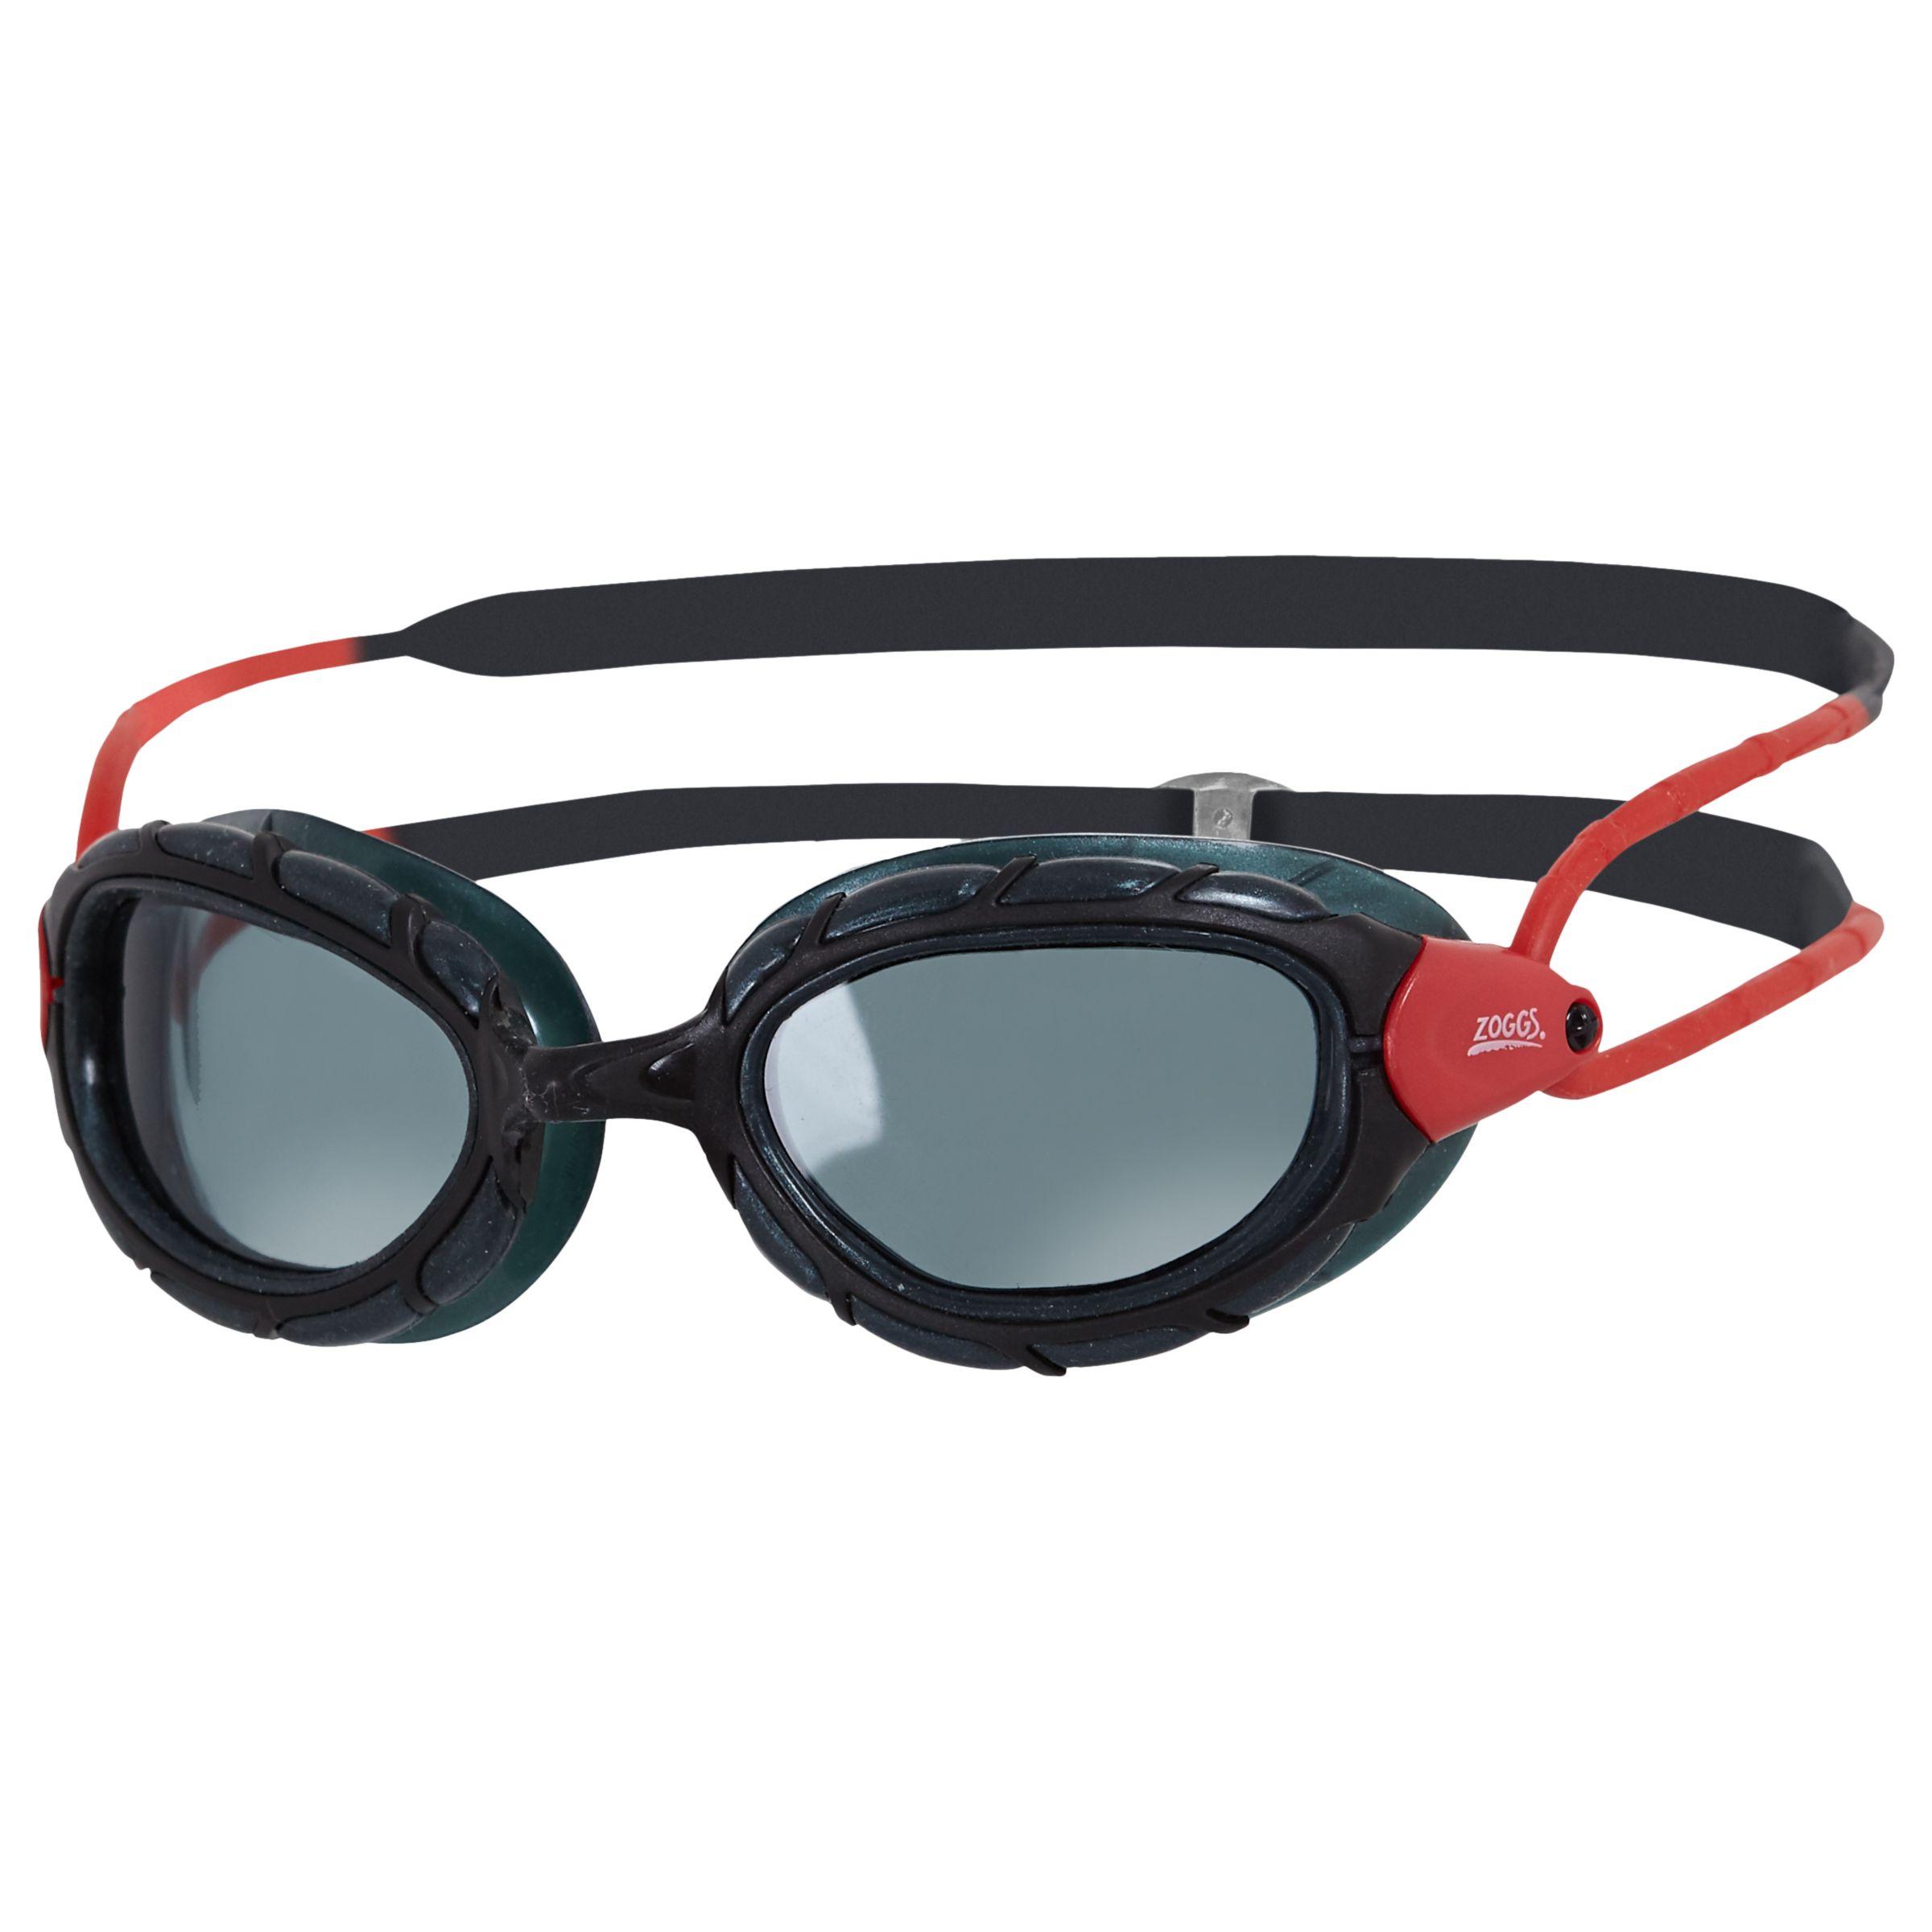 Zoggs Zoggs Predator Smoke Polarised Swimming Goggles